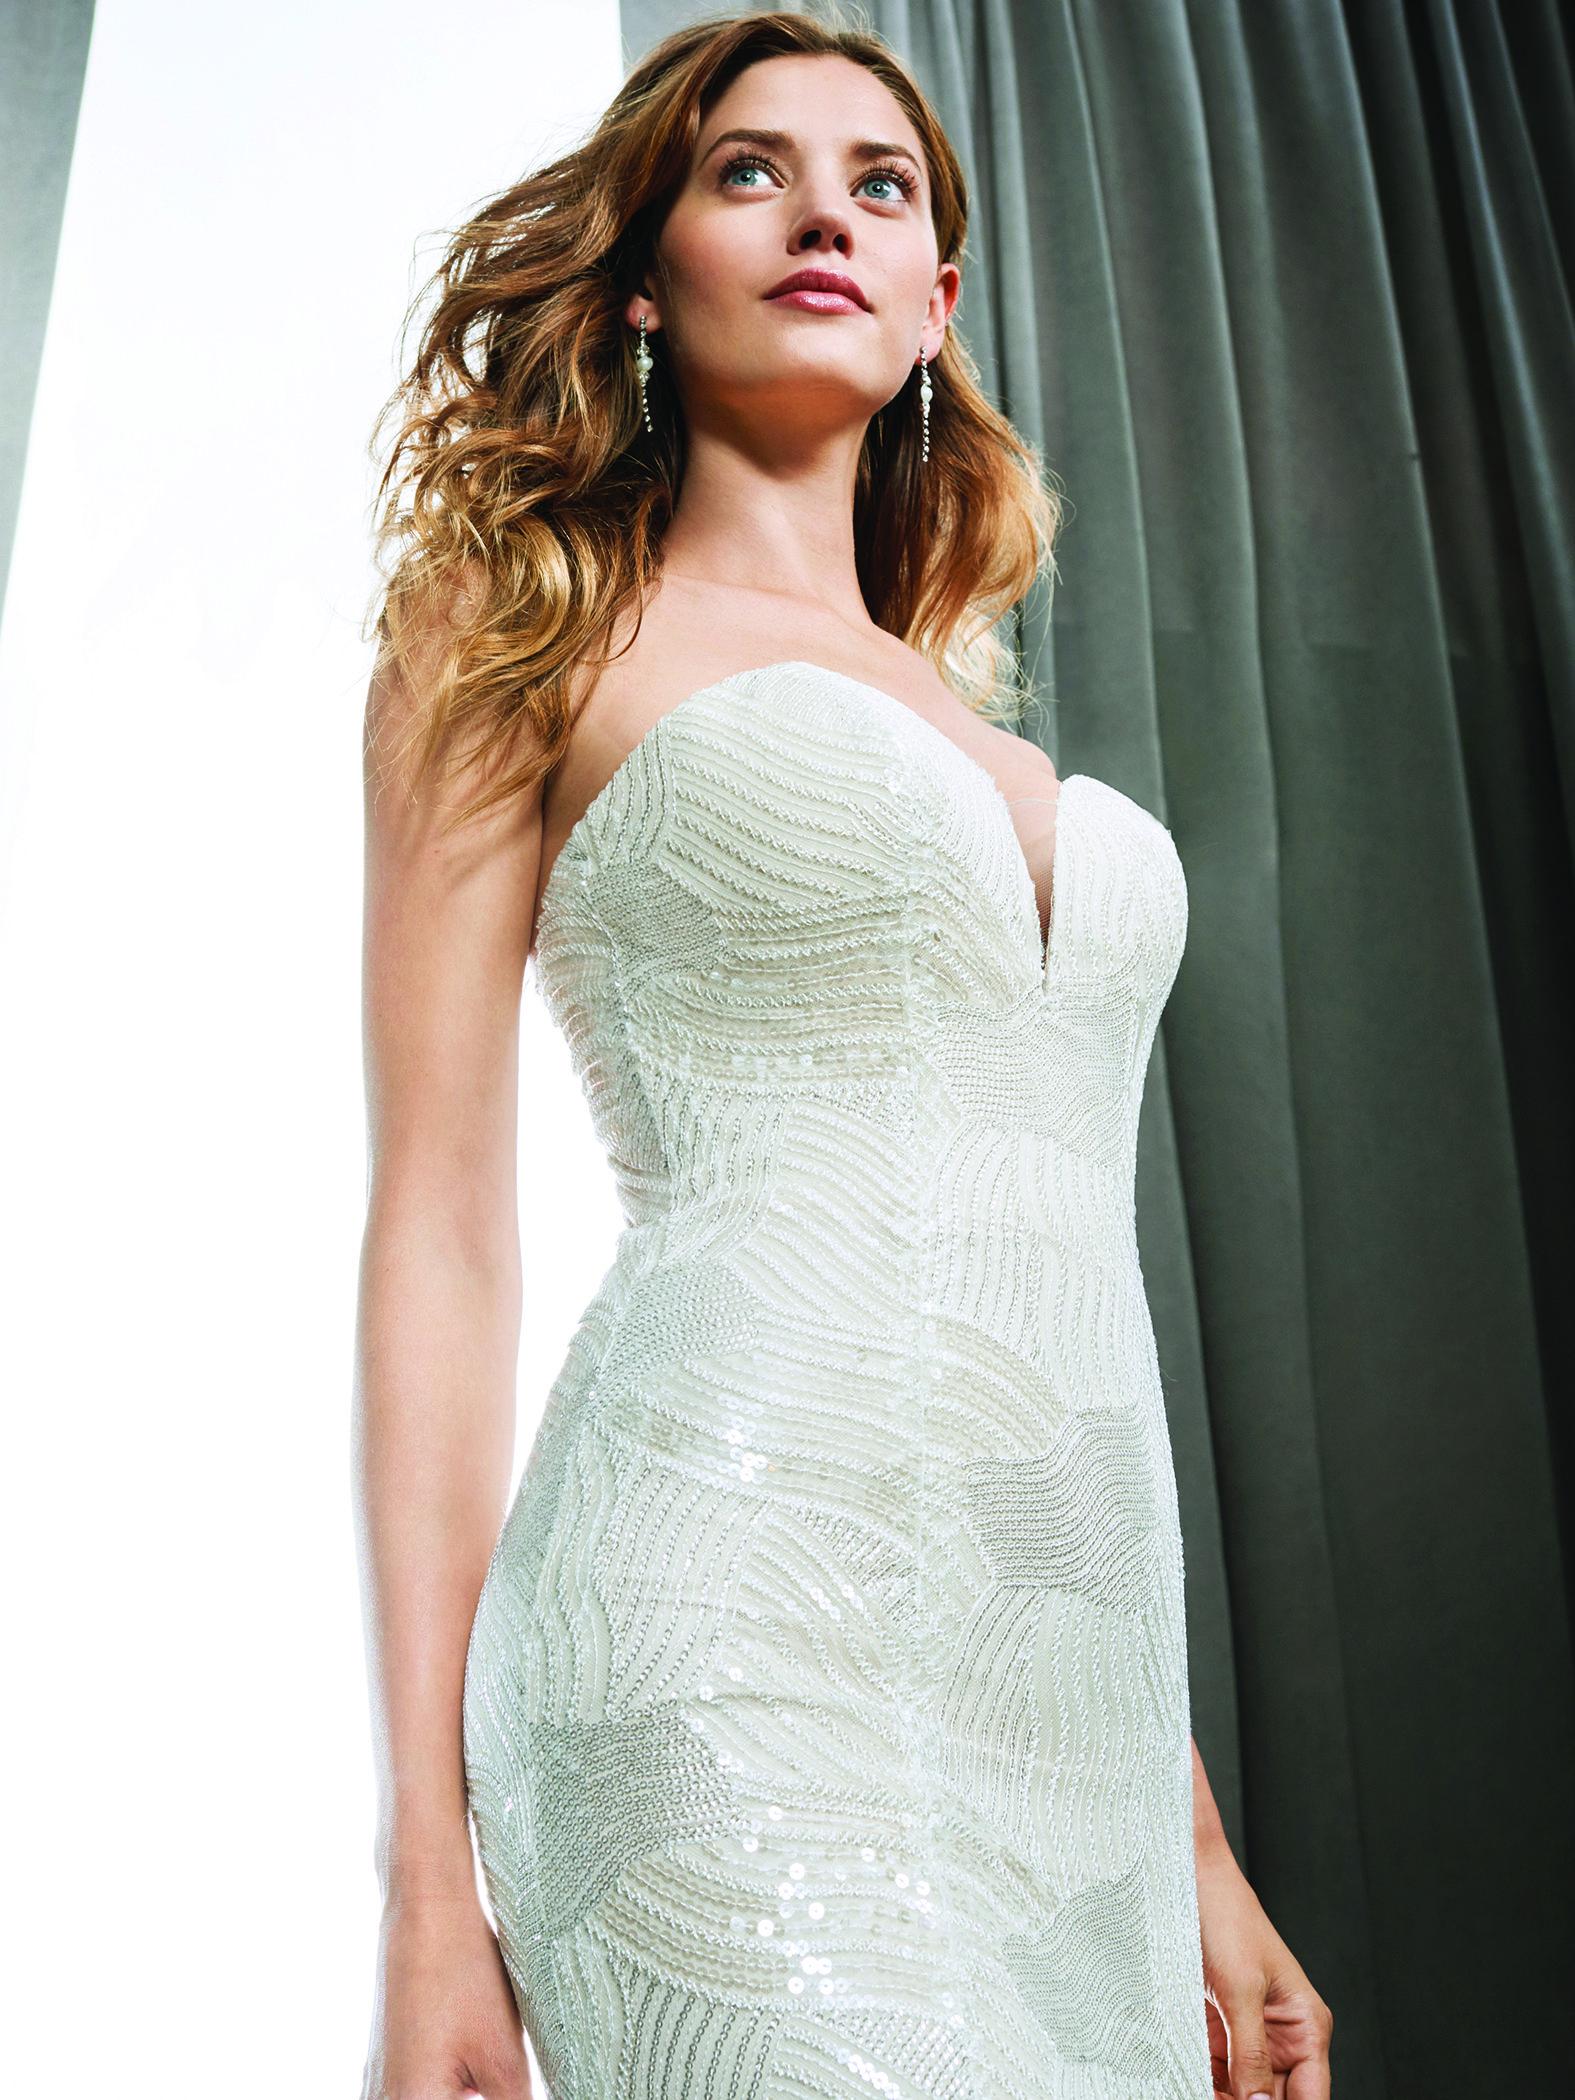 New Arrival At Panache Costa Mesa Sequin Weddingdesigner Wedding Gownsprivate